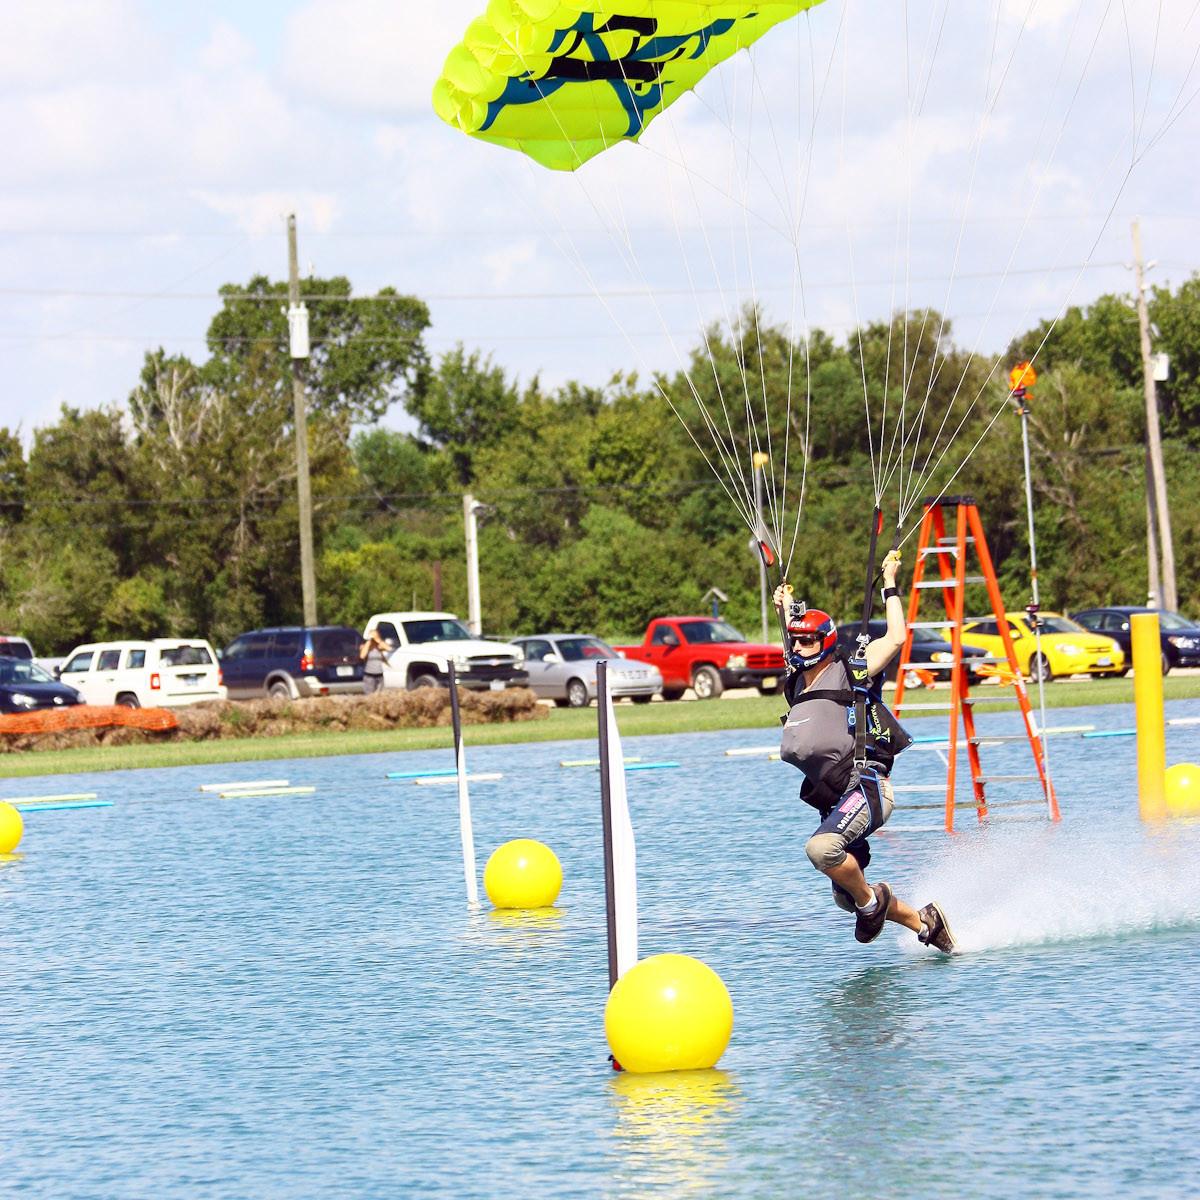 News_skydiving_Thomas Hughes